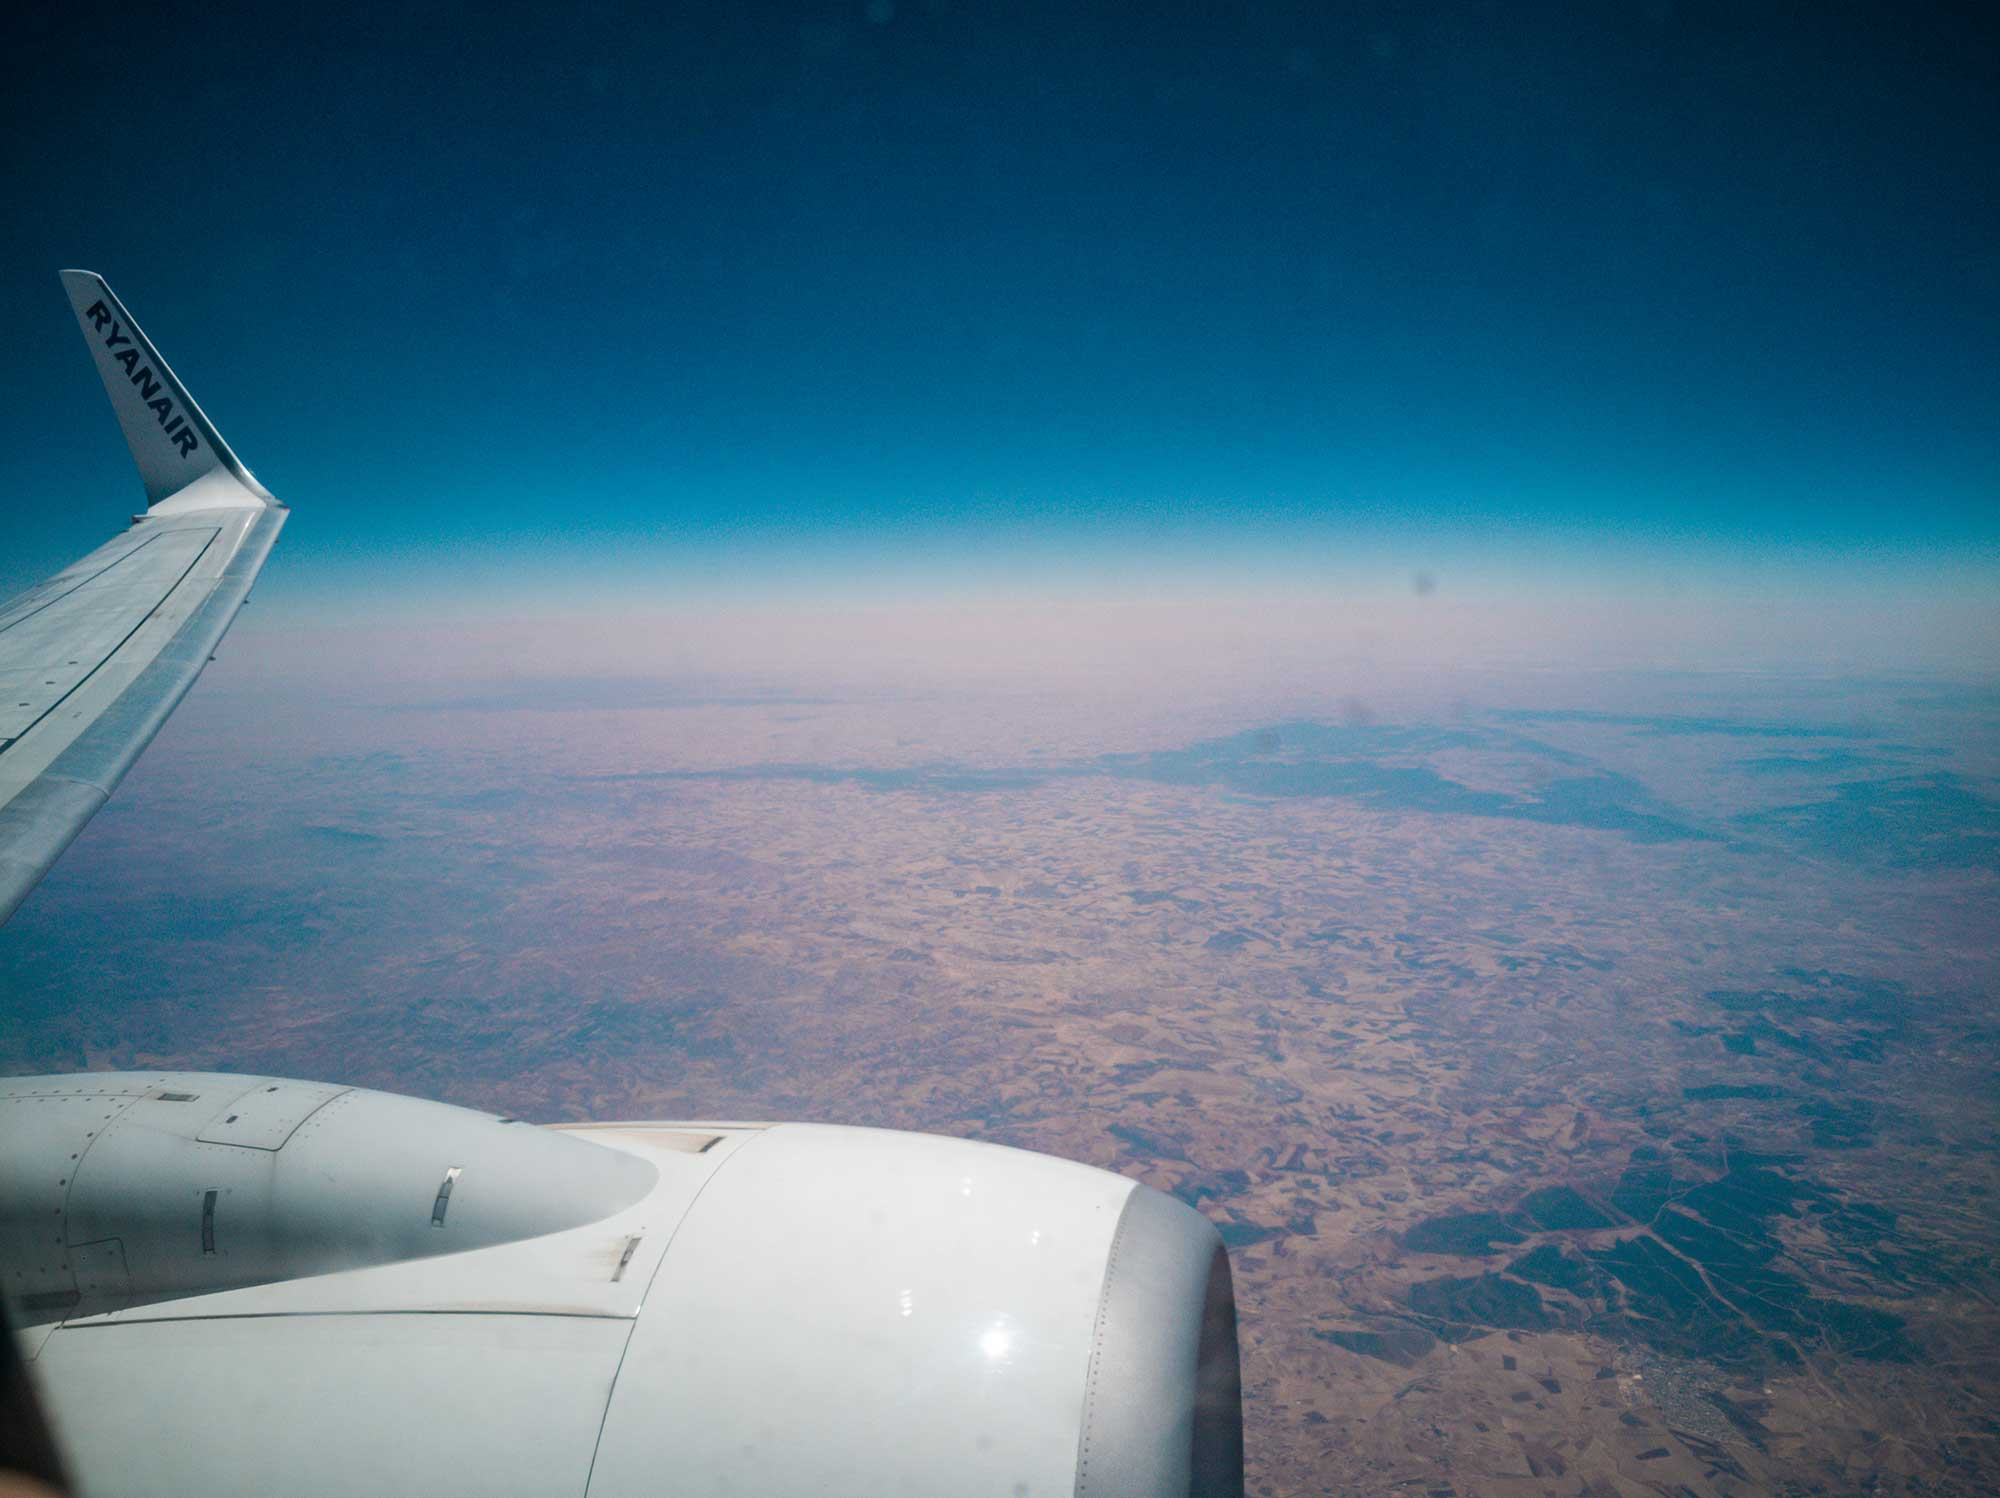 Inizia-avventura-africa-vista-finestrino